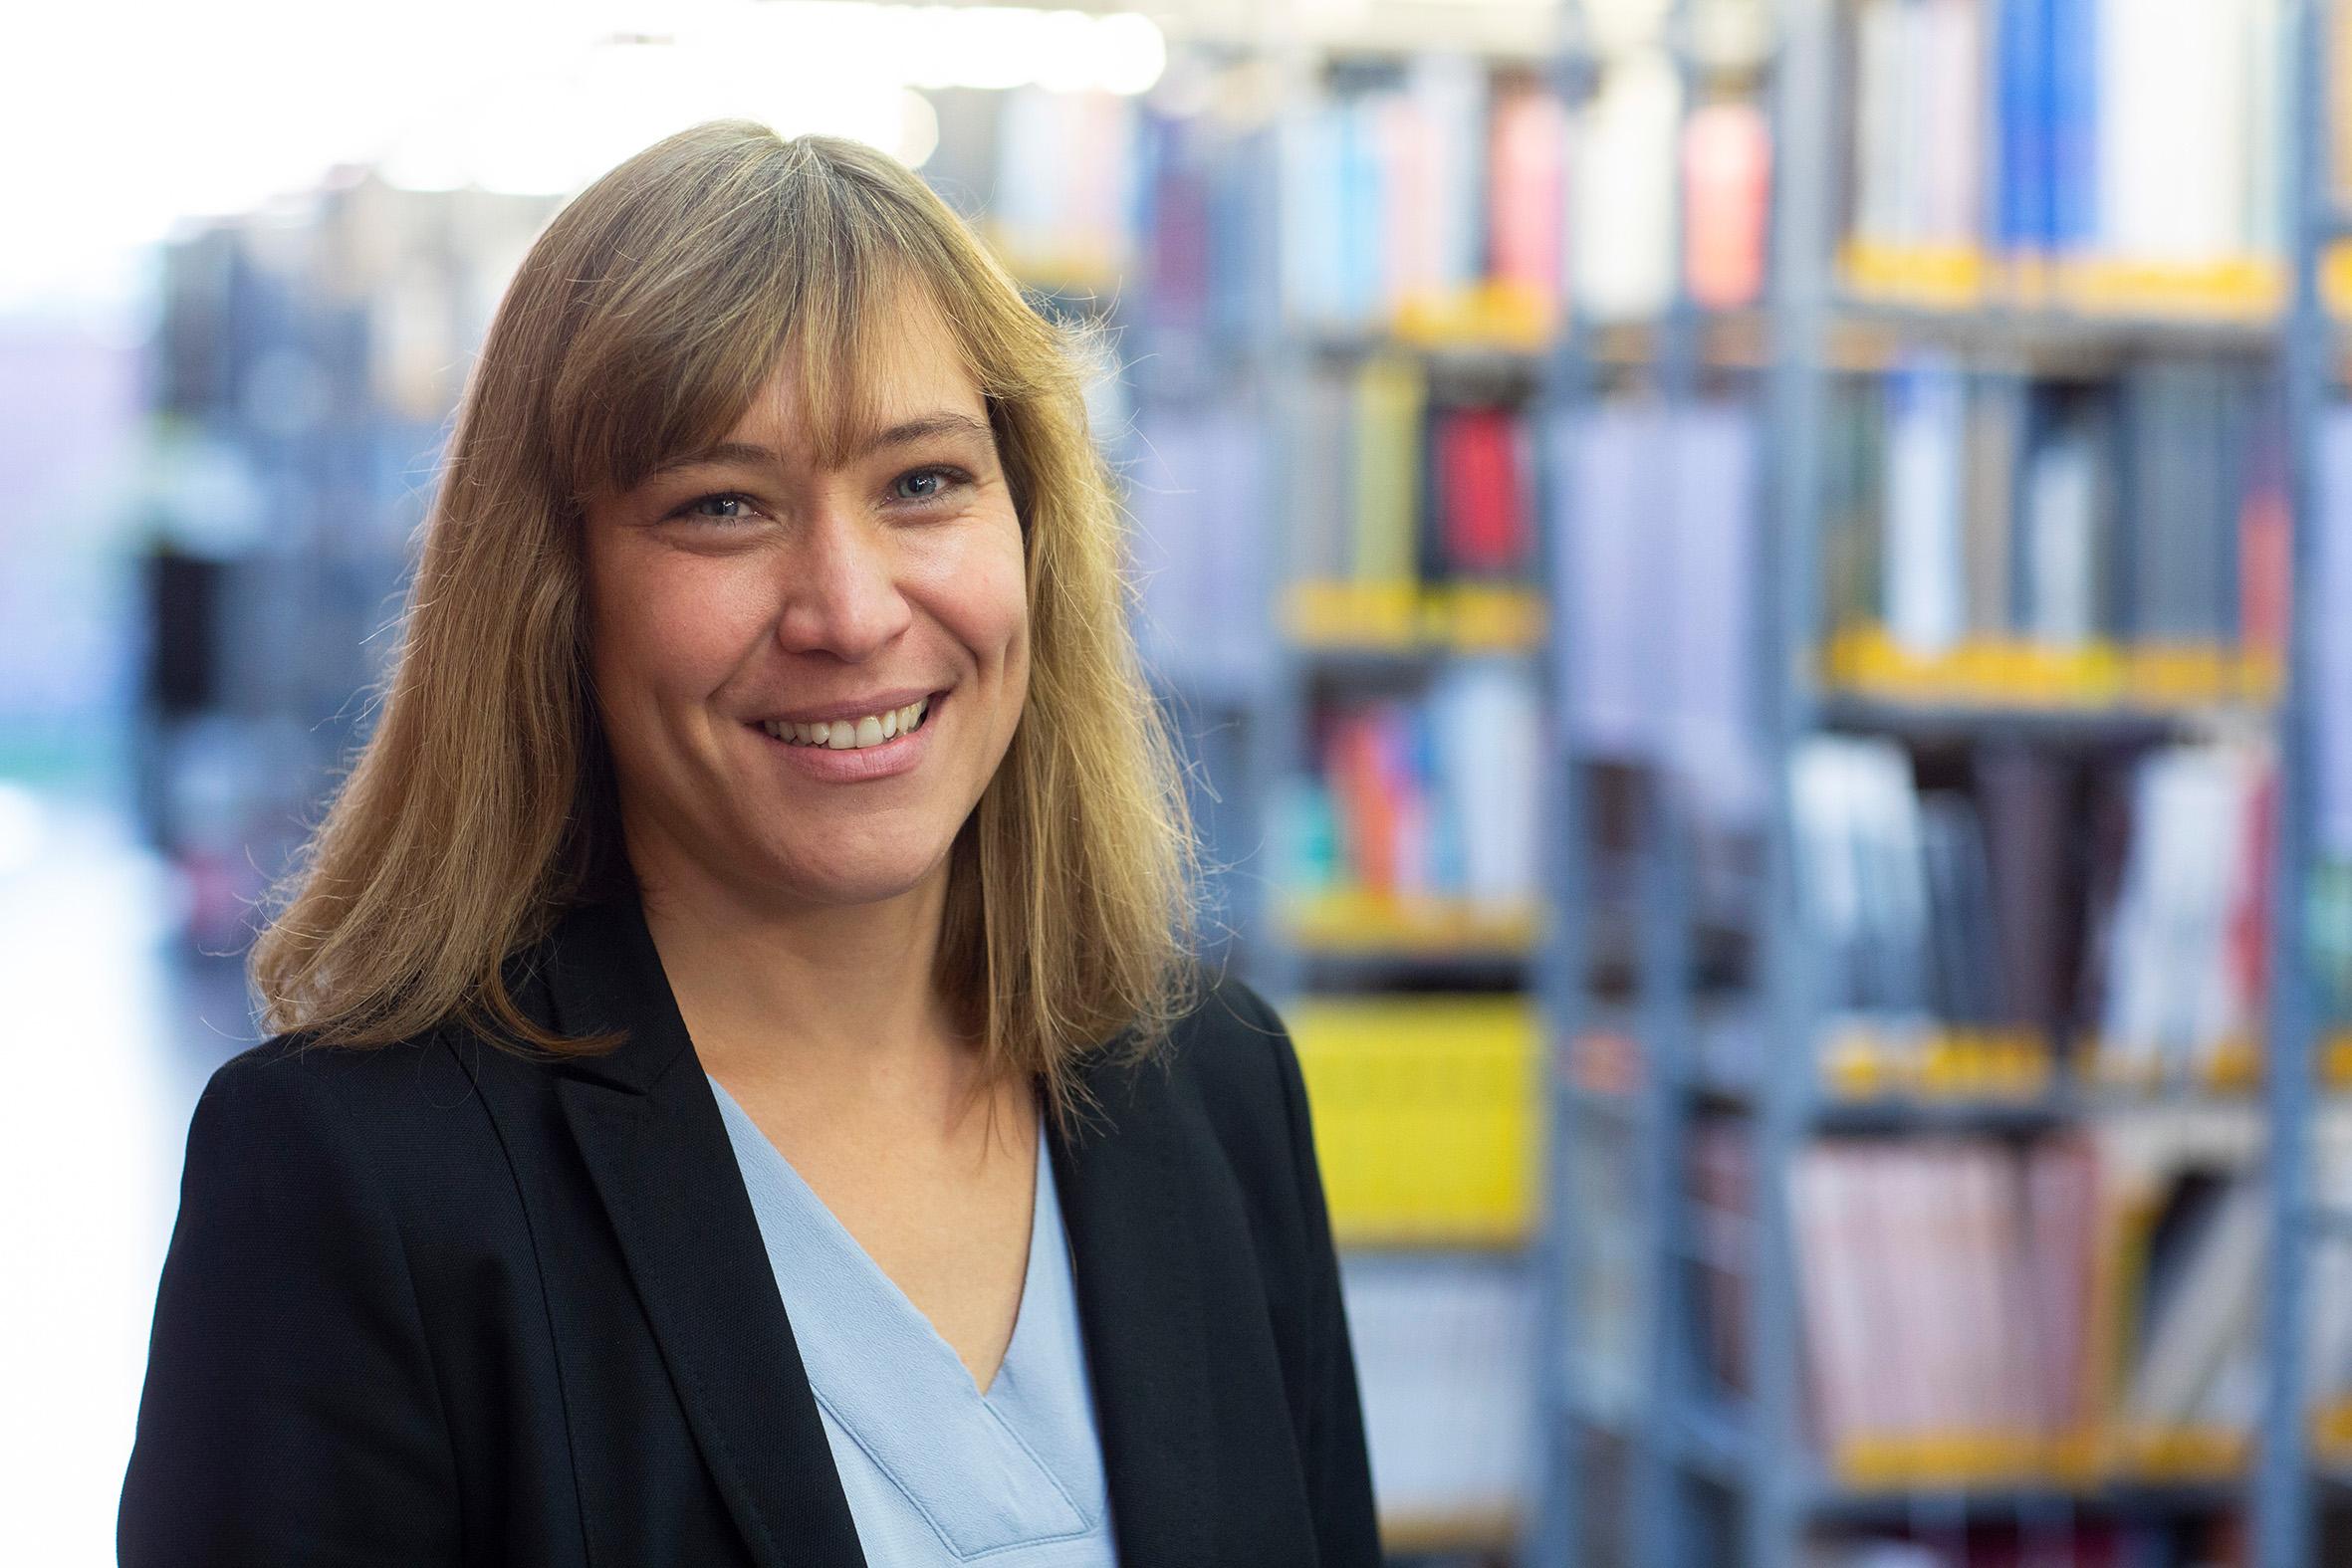 Prof. Dr. Anke Kohmäscher